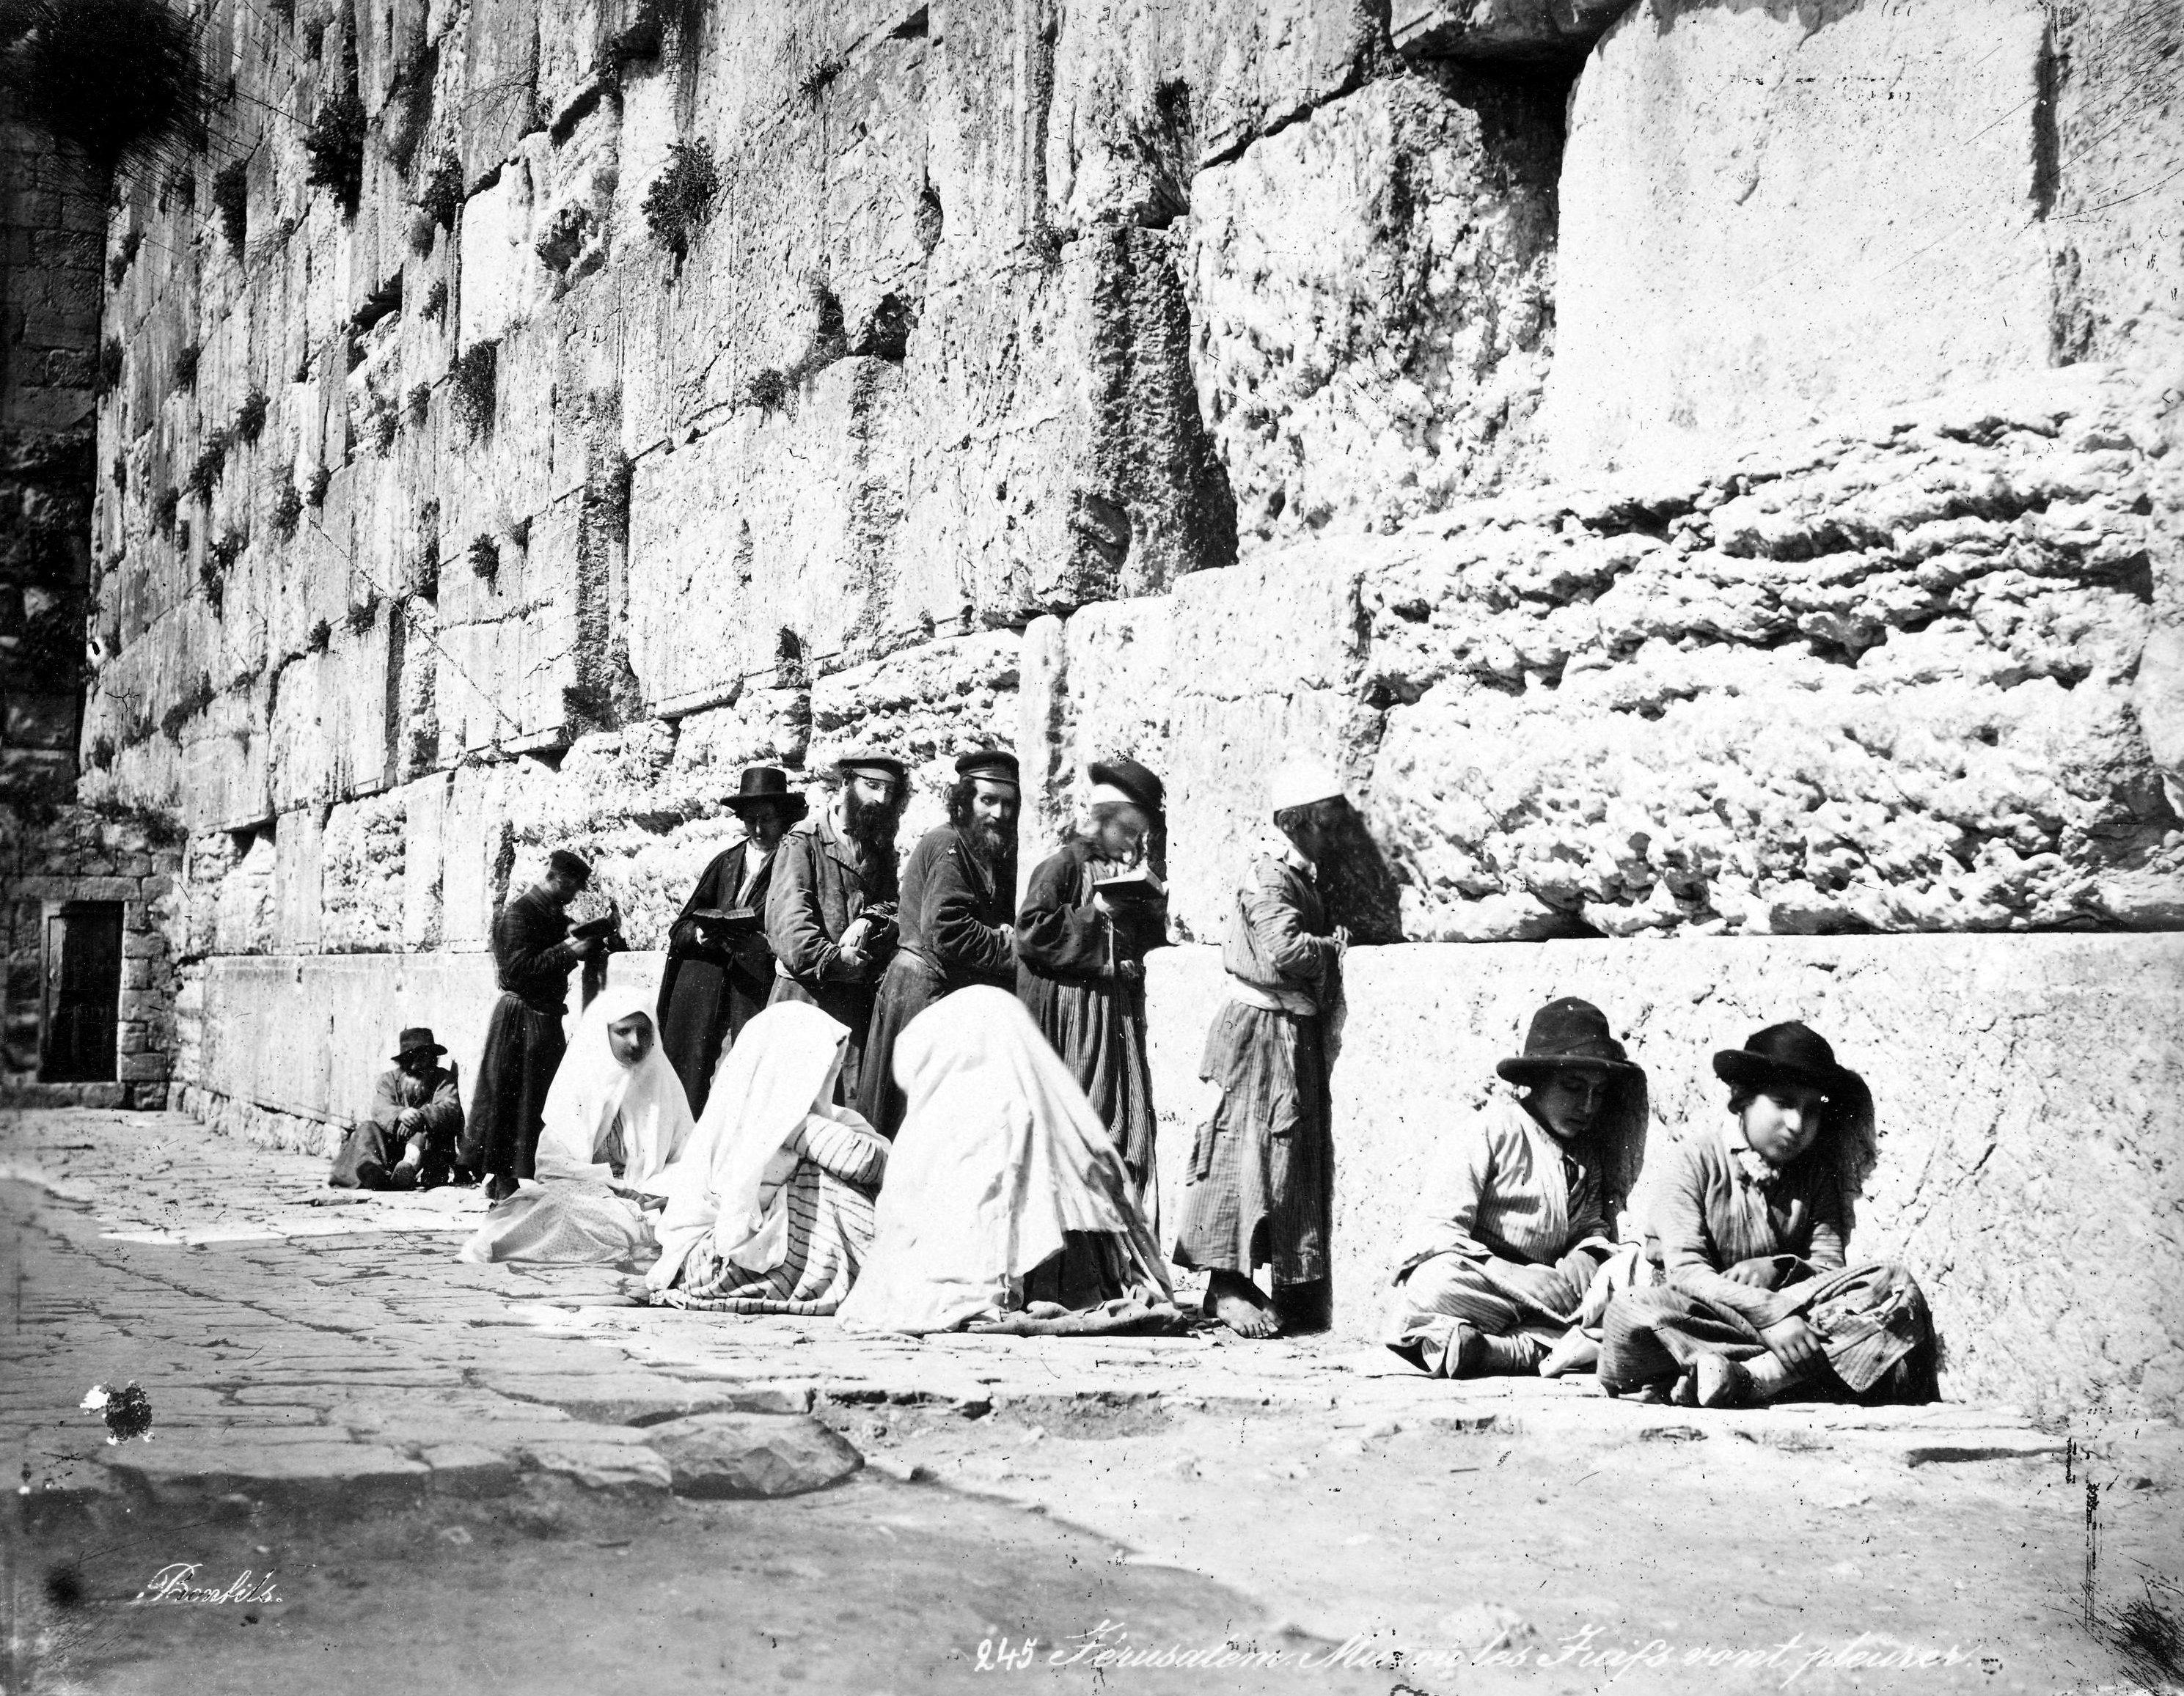 Jews at the Western Wall, Felix Bonfils, Albumen silver print, 1870s. (Wikimedia Photo)